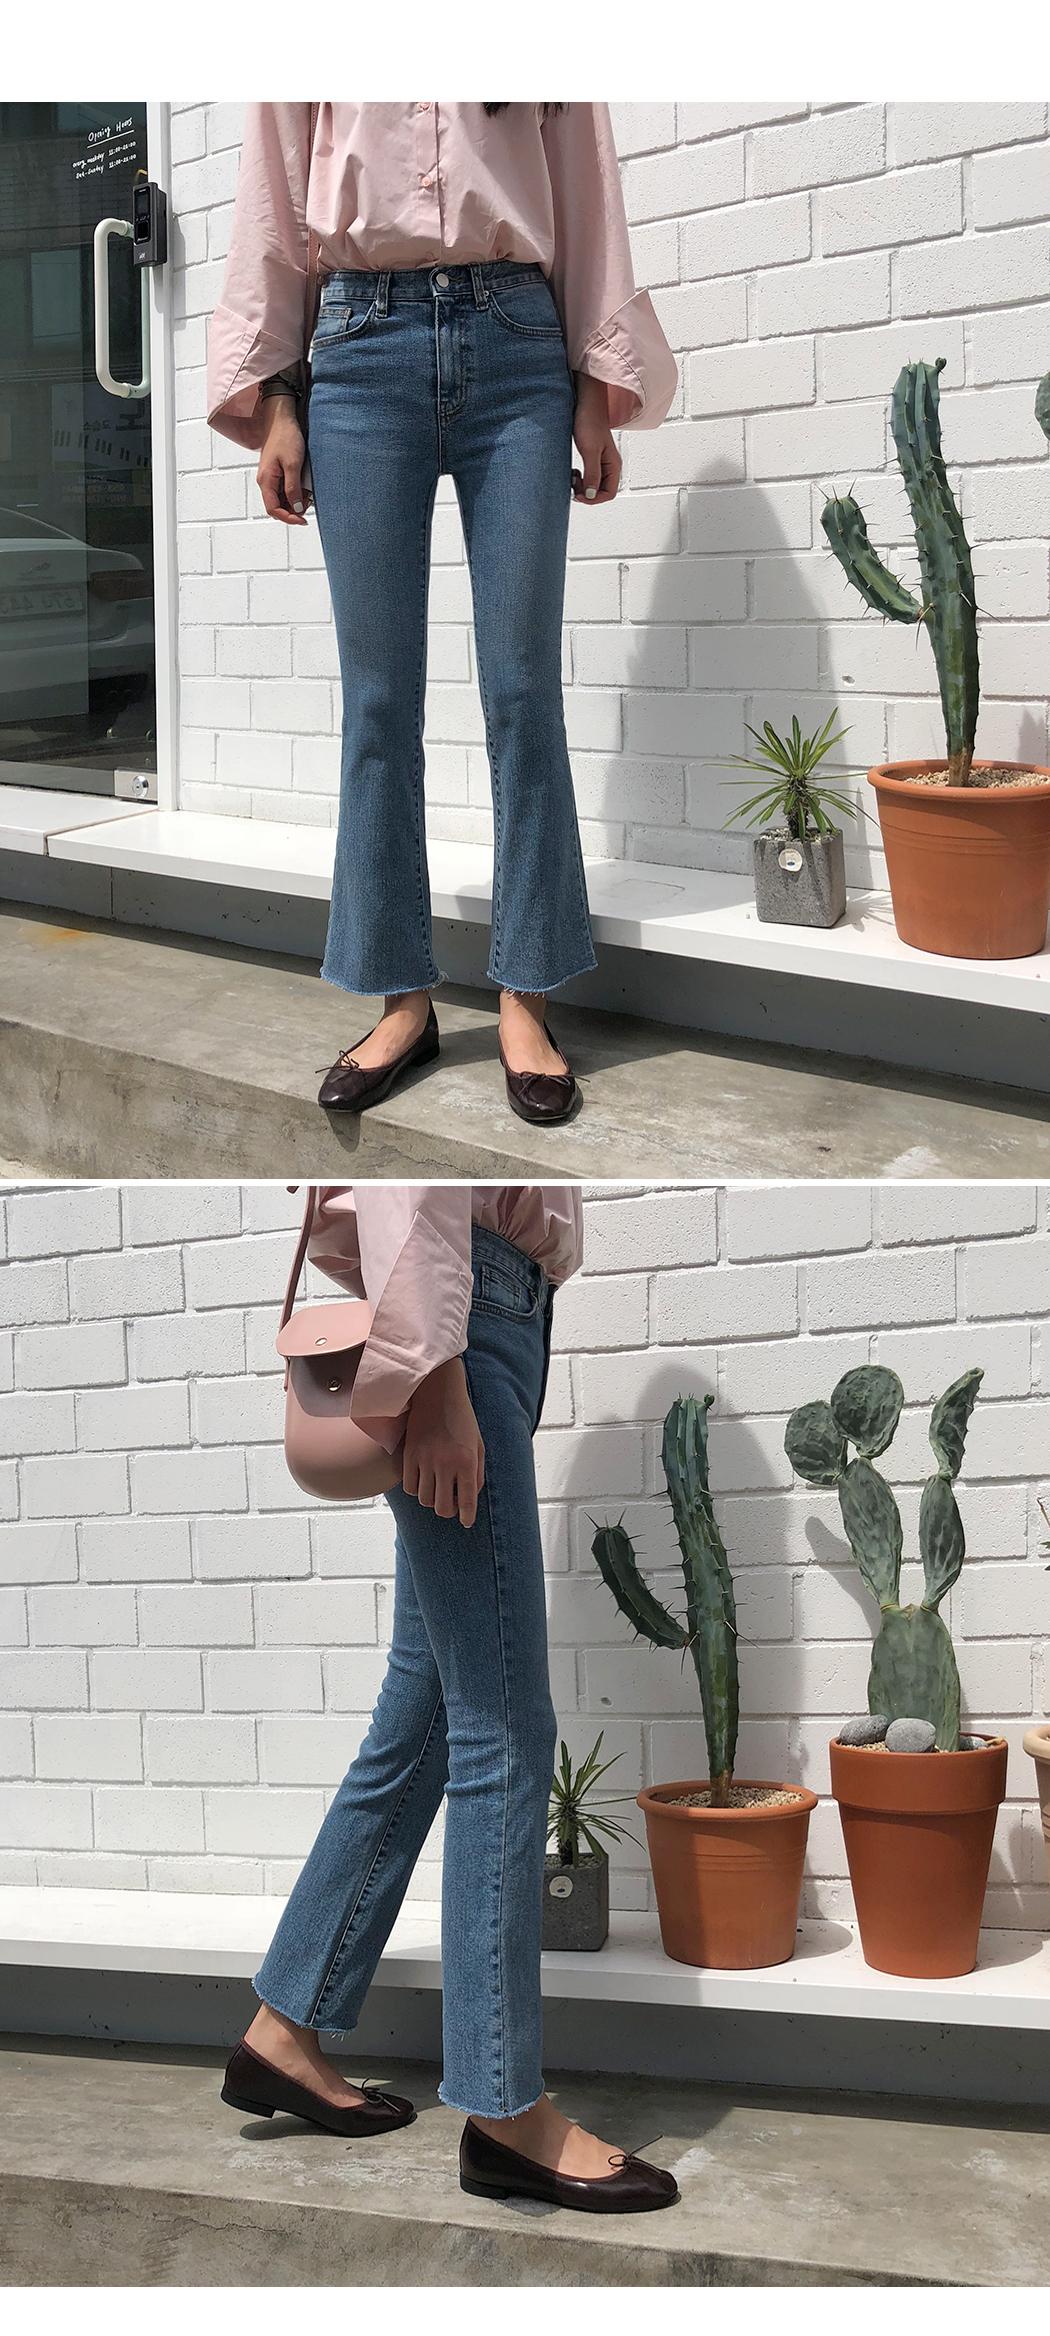 Jason-slim boots cut pants